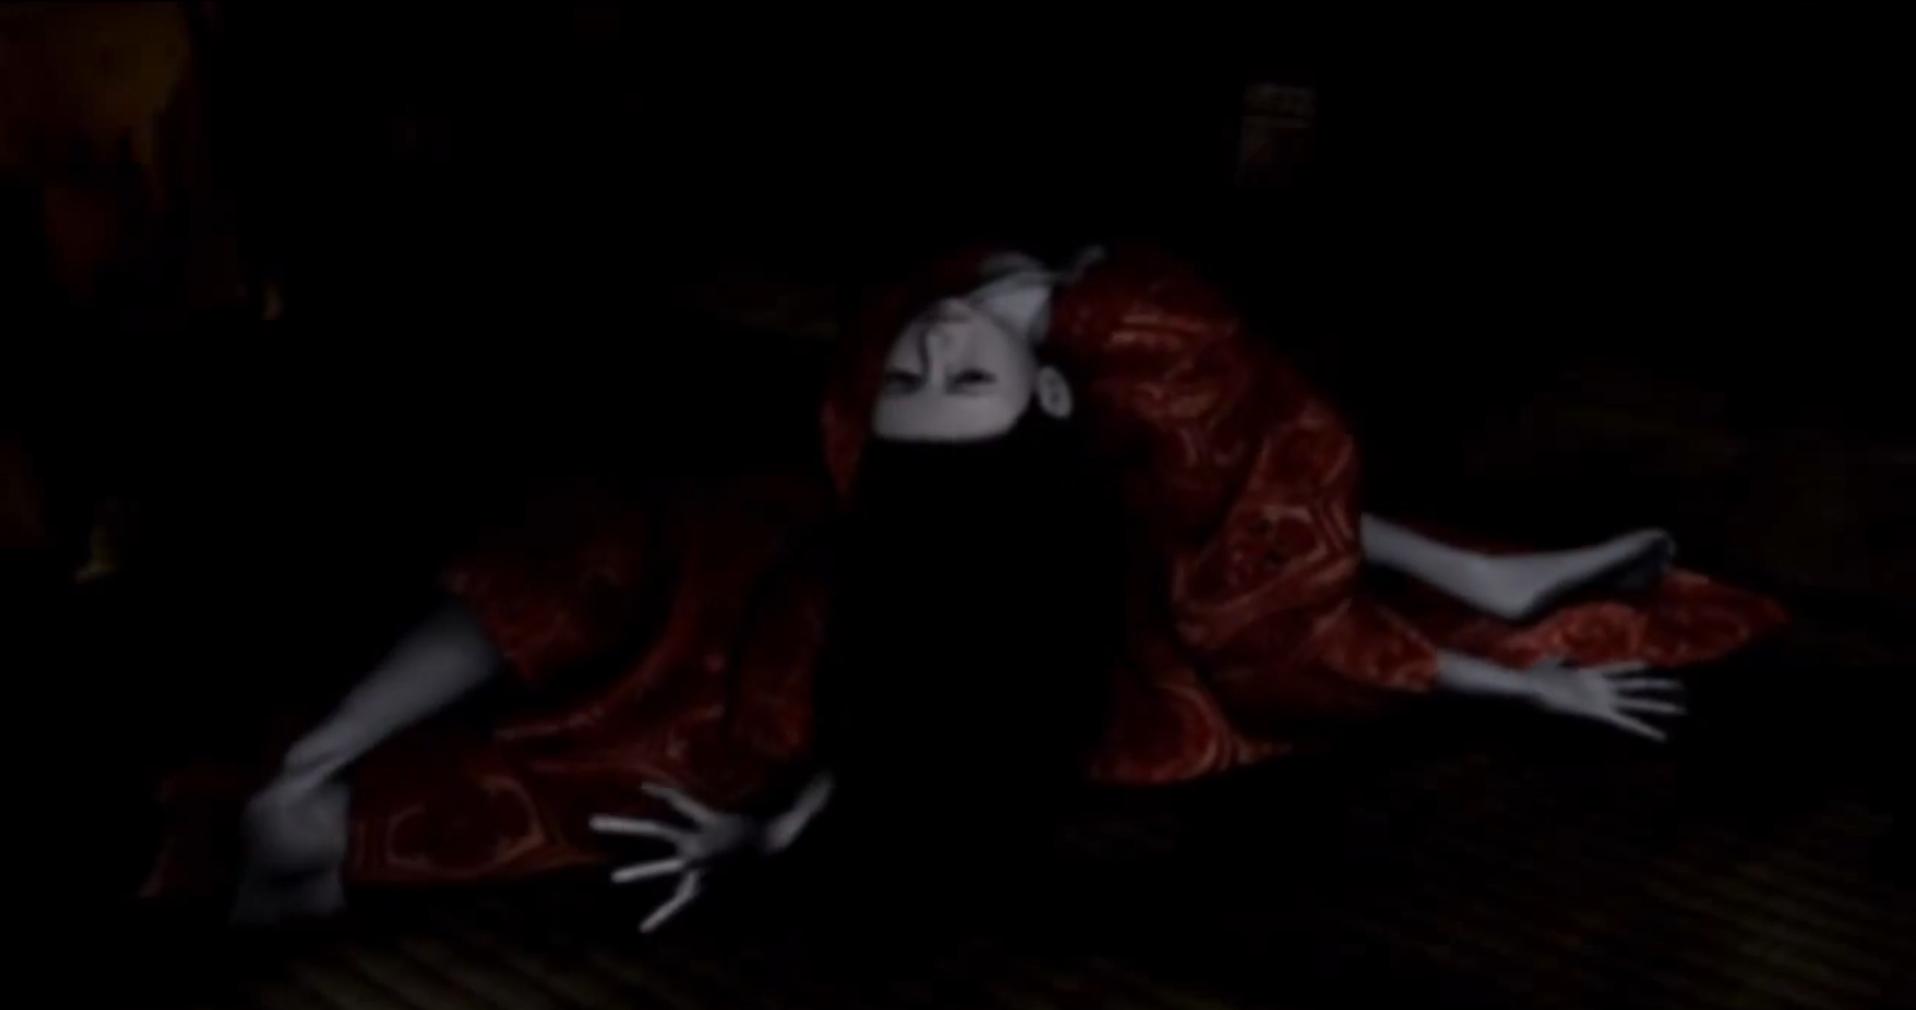 fatal-frame-ghost.png (1916×1010) | Memento Mori. | Pinterest ...